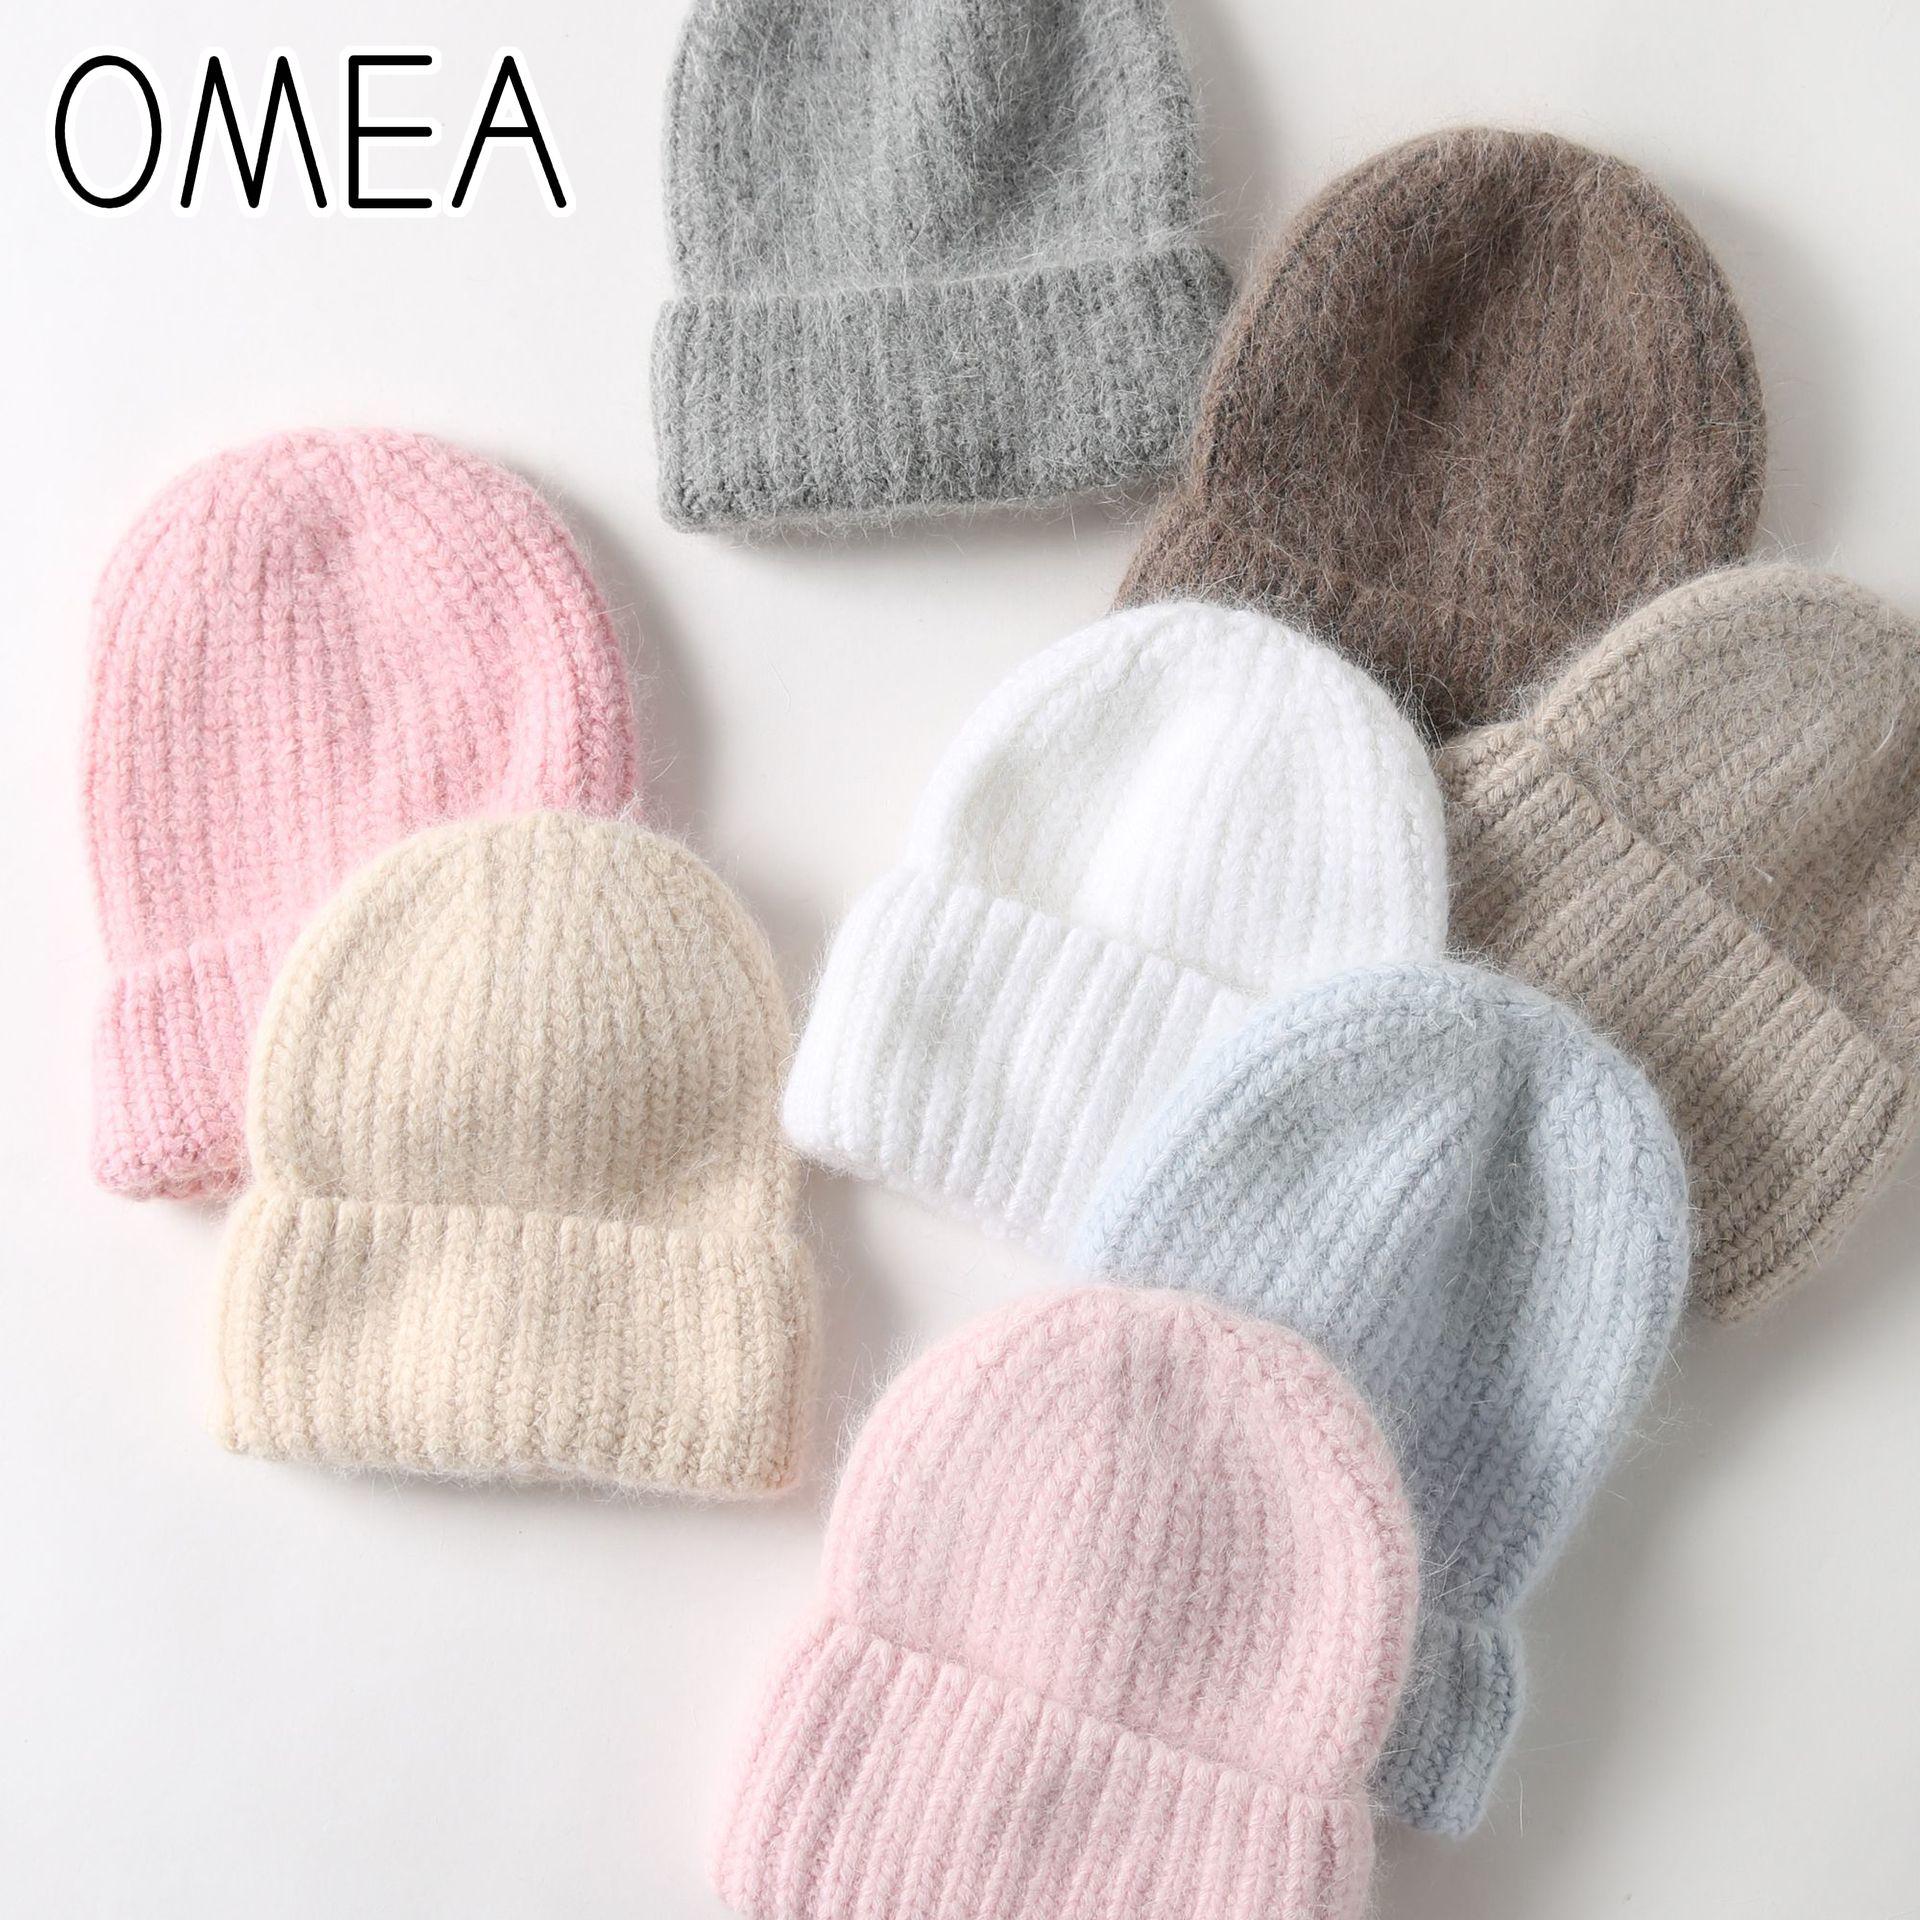 OMEA Angora Rabbit Fur Winter Hat Women Wool Hat Men Gift Fashion Knitting Cotton Hat Men Gift Beanie Cashmere Cap Solid Color